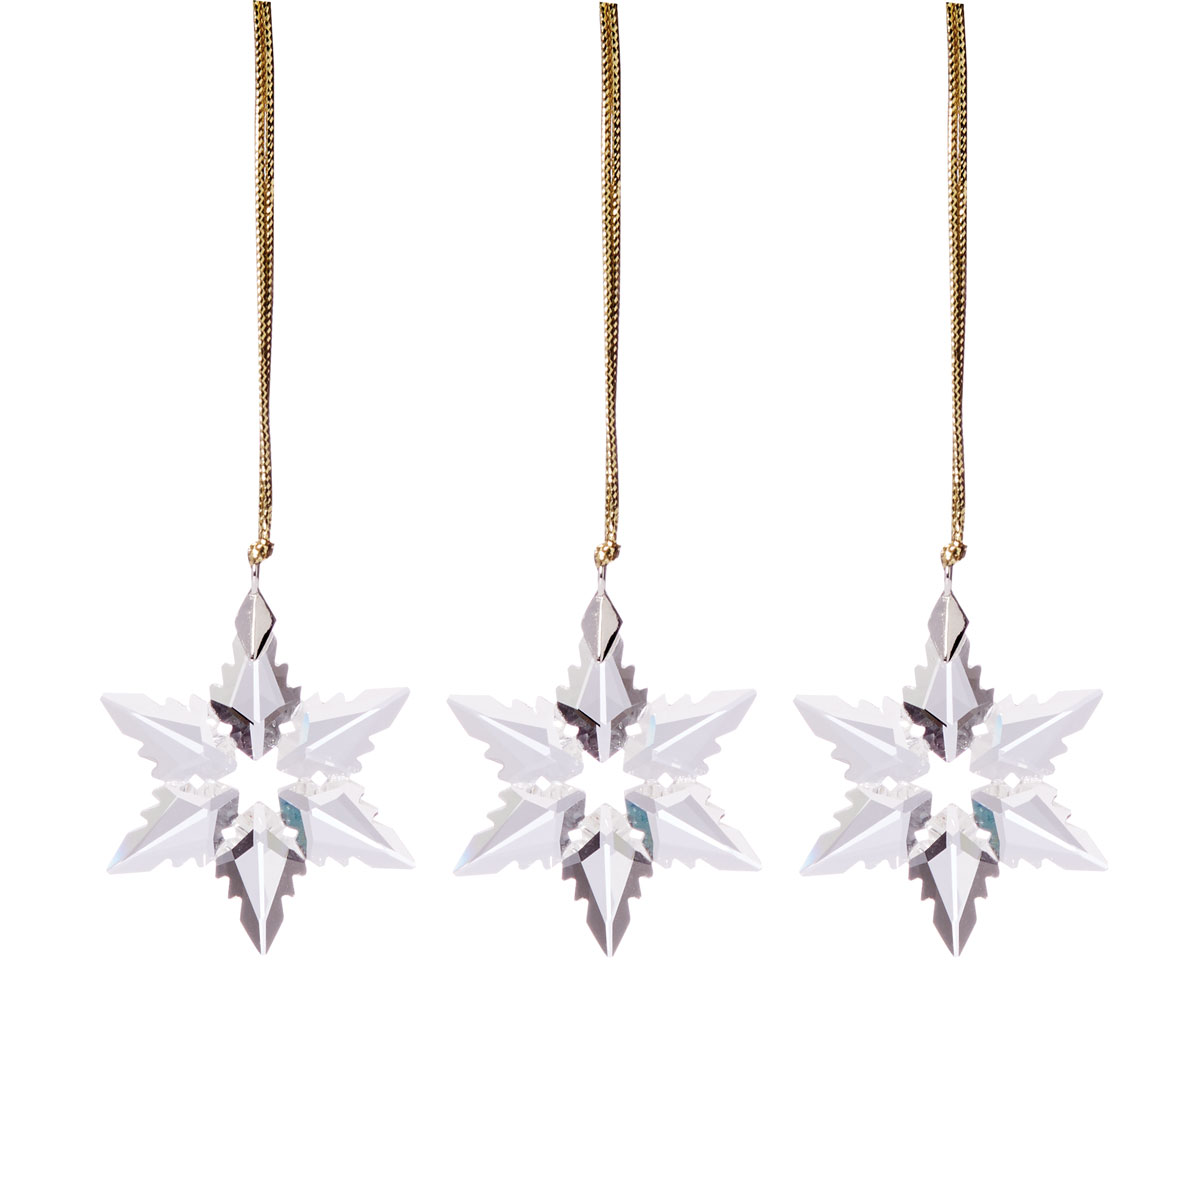 Lenox 2021 Mini Optic Snowflake Crystal Ornament Set of 3